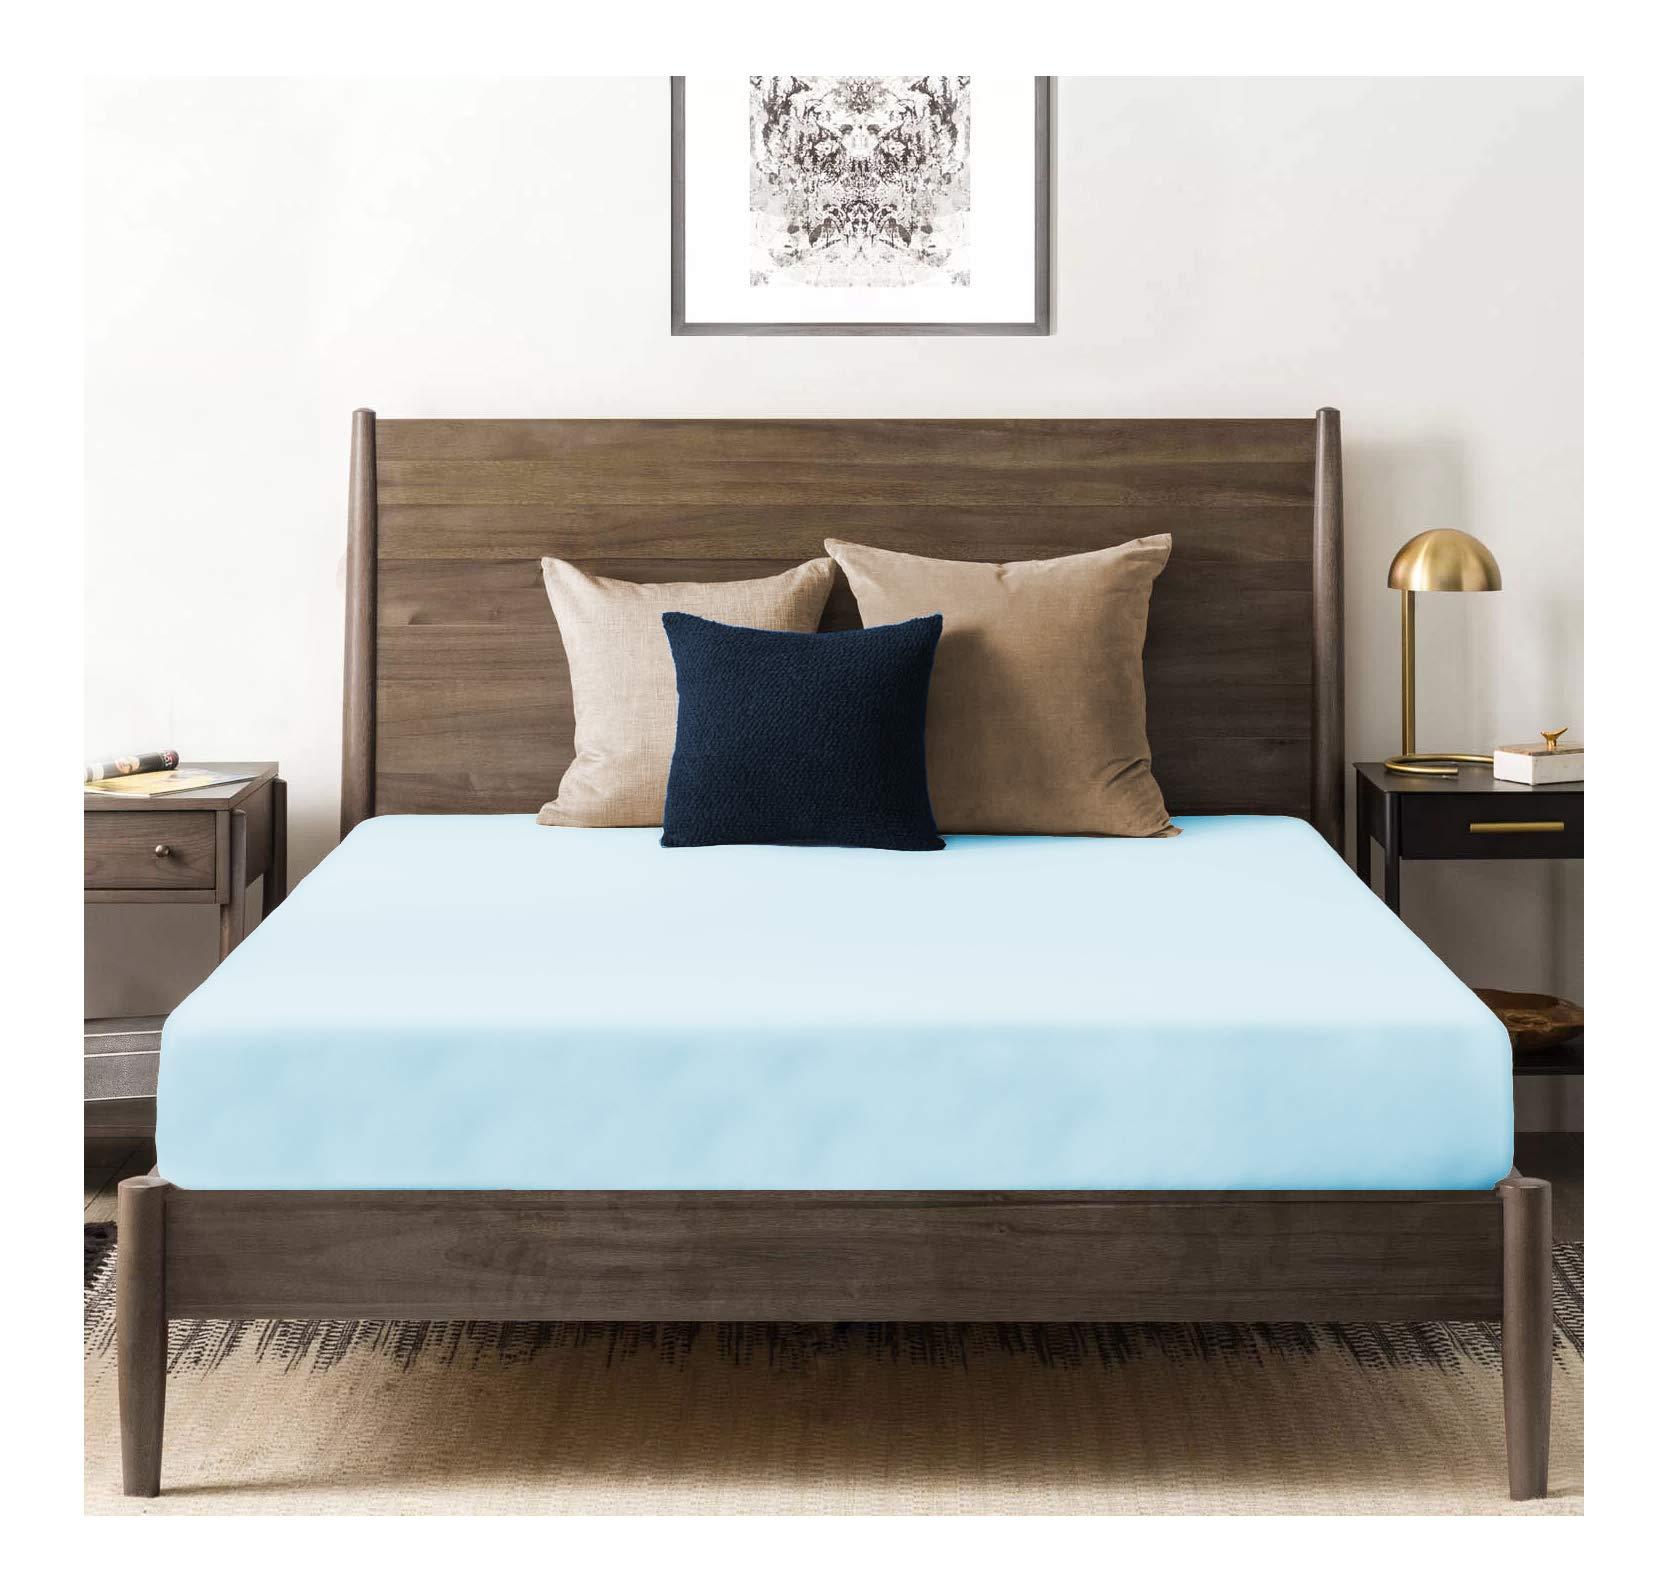 "Tissaj Organic Cotton Fitted Sheet - 500 TC Thread Count King Size Ice Blue - Bedding - 100% GOTS Certified Extra Long Staple, Soft Sateen Weave - Fits 15"" Deep Pocket Mattress"